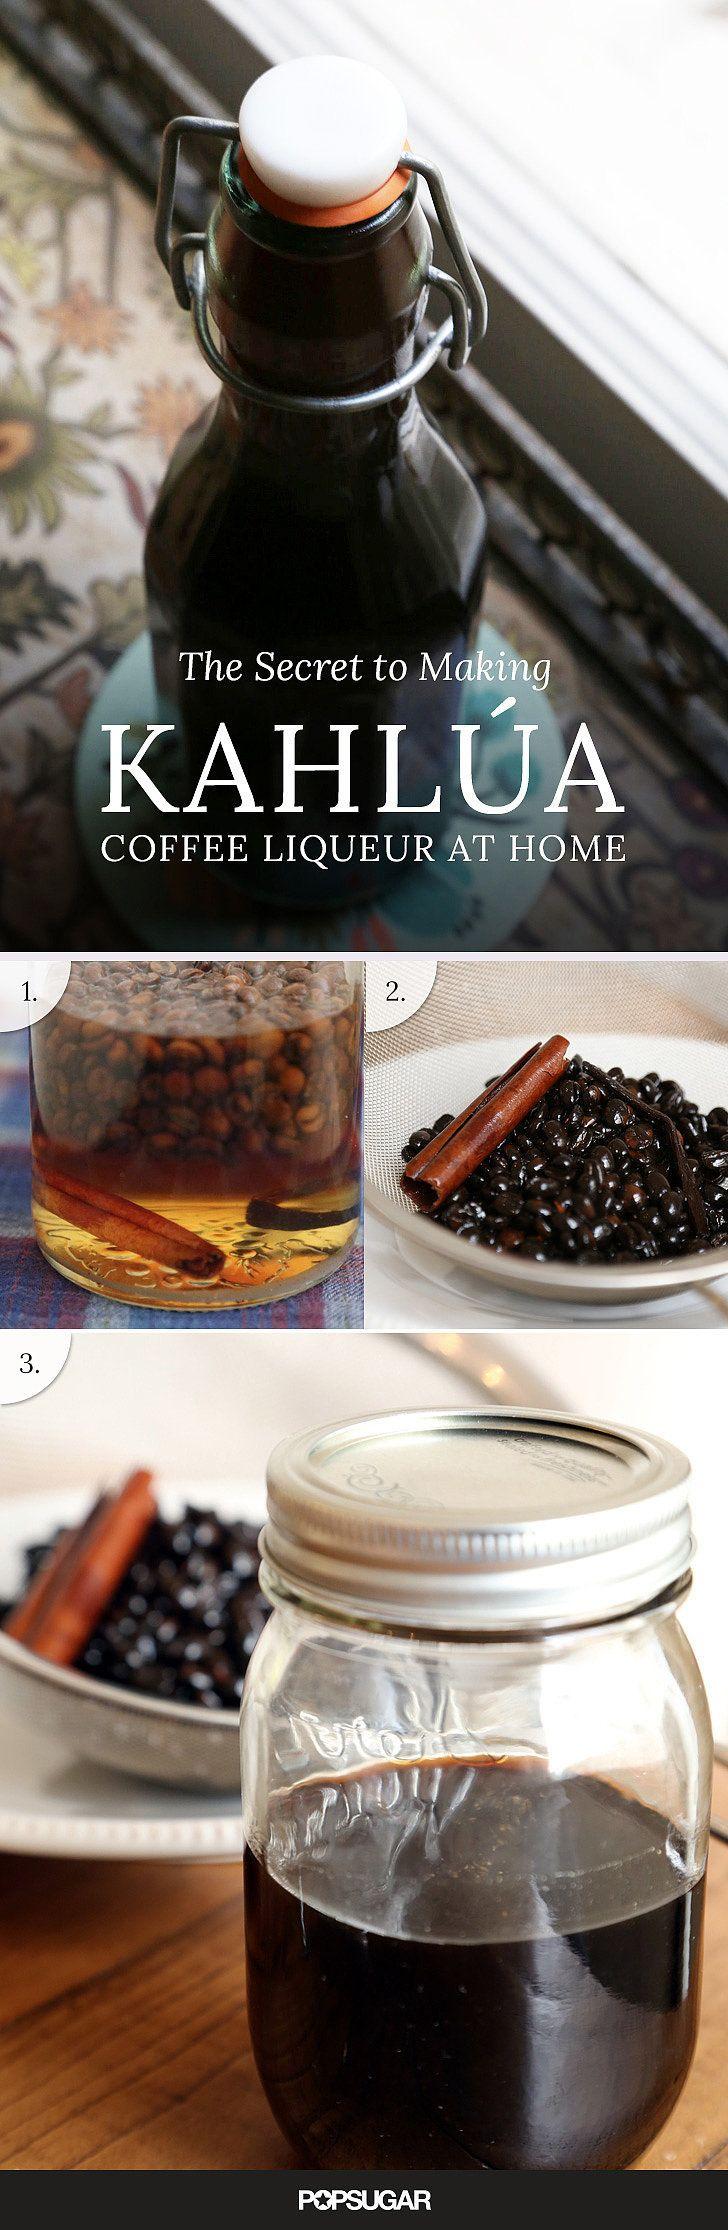 Kahlúa Coffee Liqueur  1 (750 ml) bottle vodka or white rum 1 1/4 cups dark rum, like Pampero 1 1/2 cups sugar 3/4 pound whole coffee beans 1 vanilla bean 1 cinnamon stick 1 tablespoon cocoa nibs, optional 1 slice of orange peel, optional